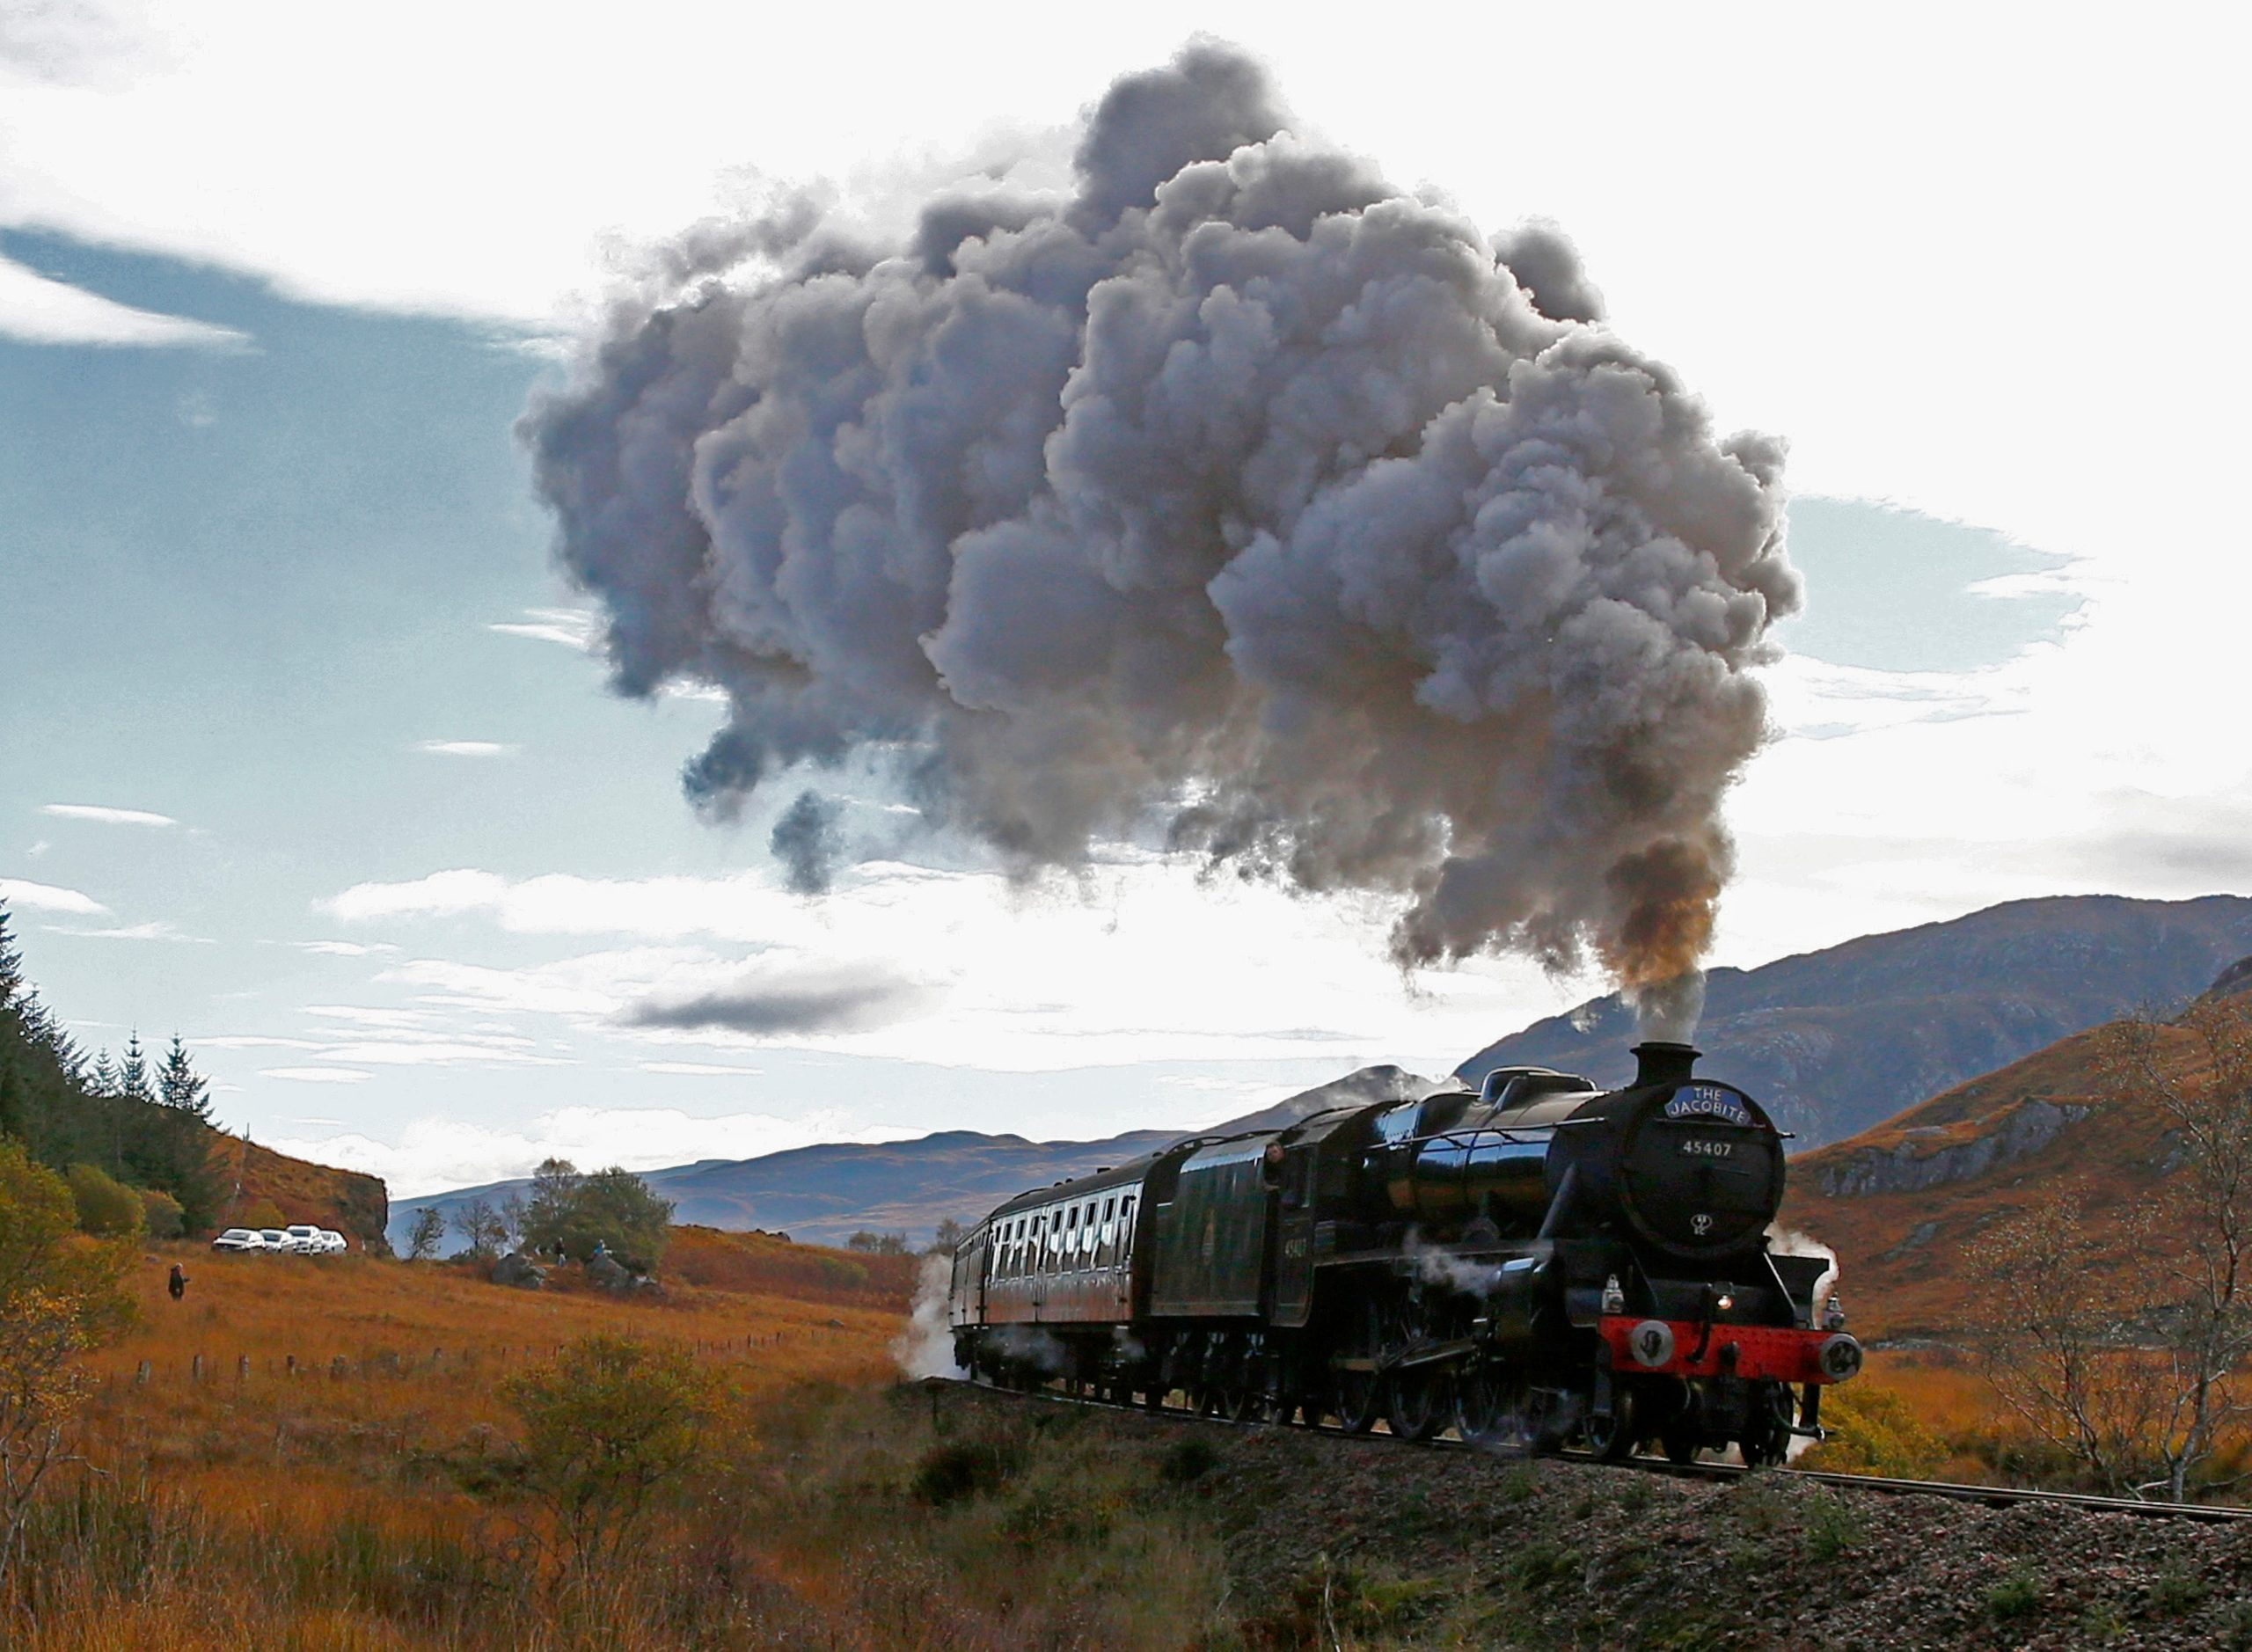 The Jacobite steam train LMS Stanier.